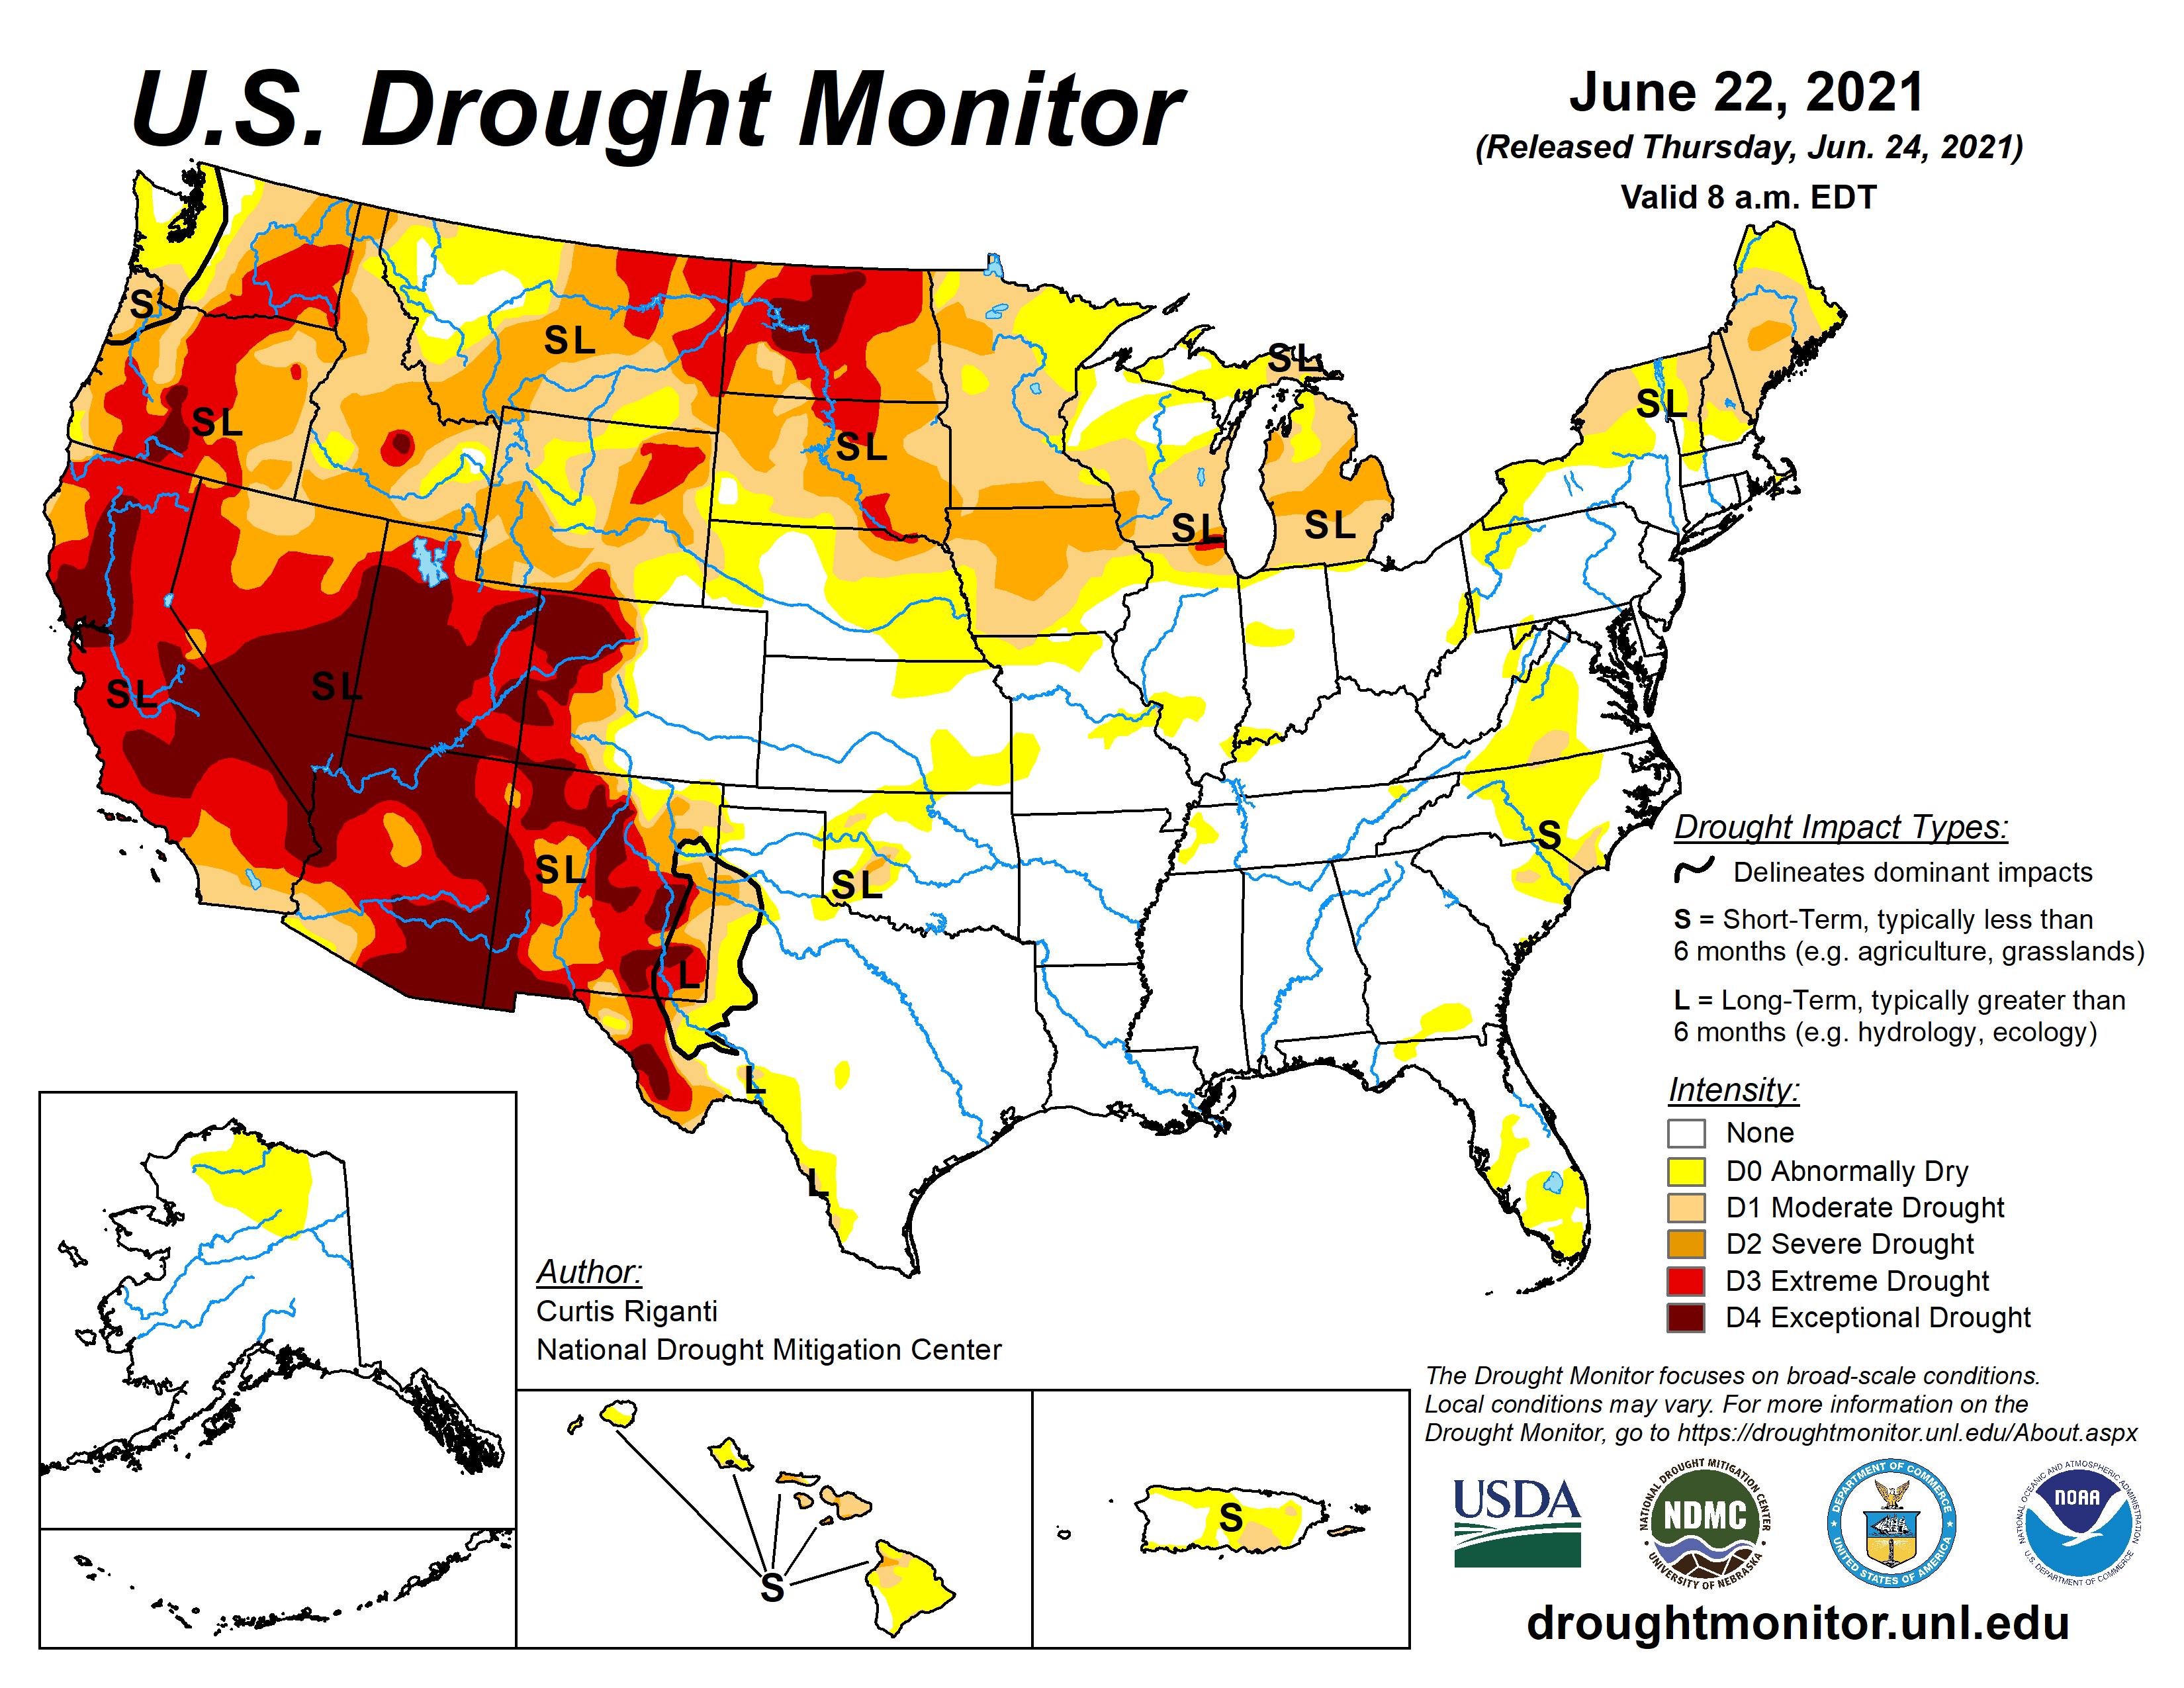 U.S. Drought Map as of Jun. 22, 2021